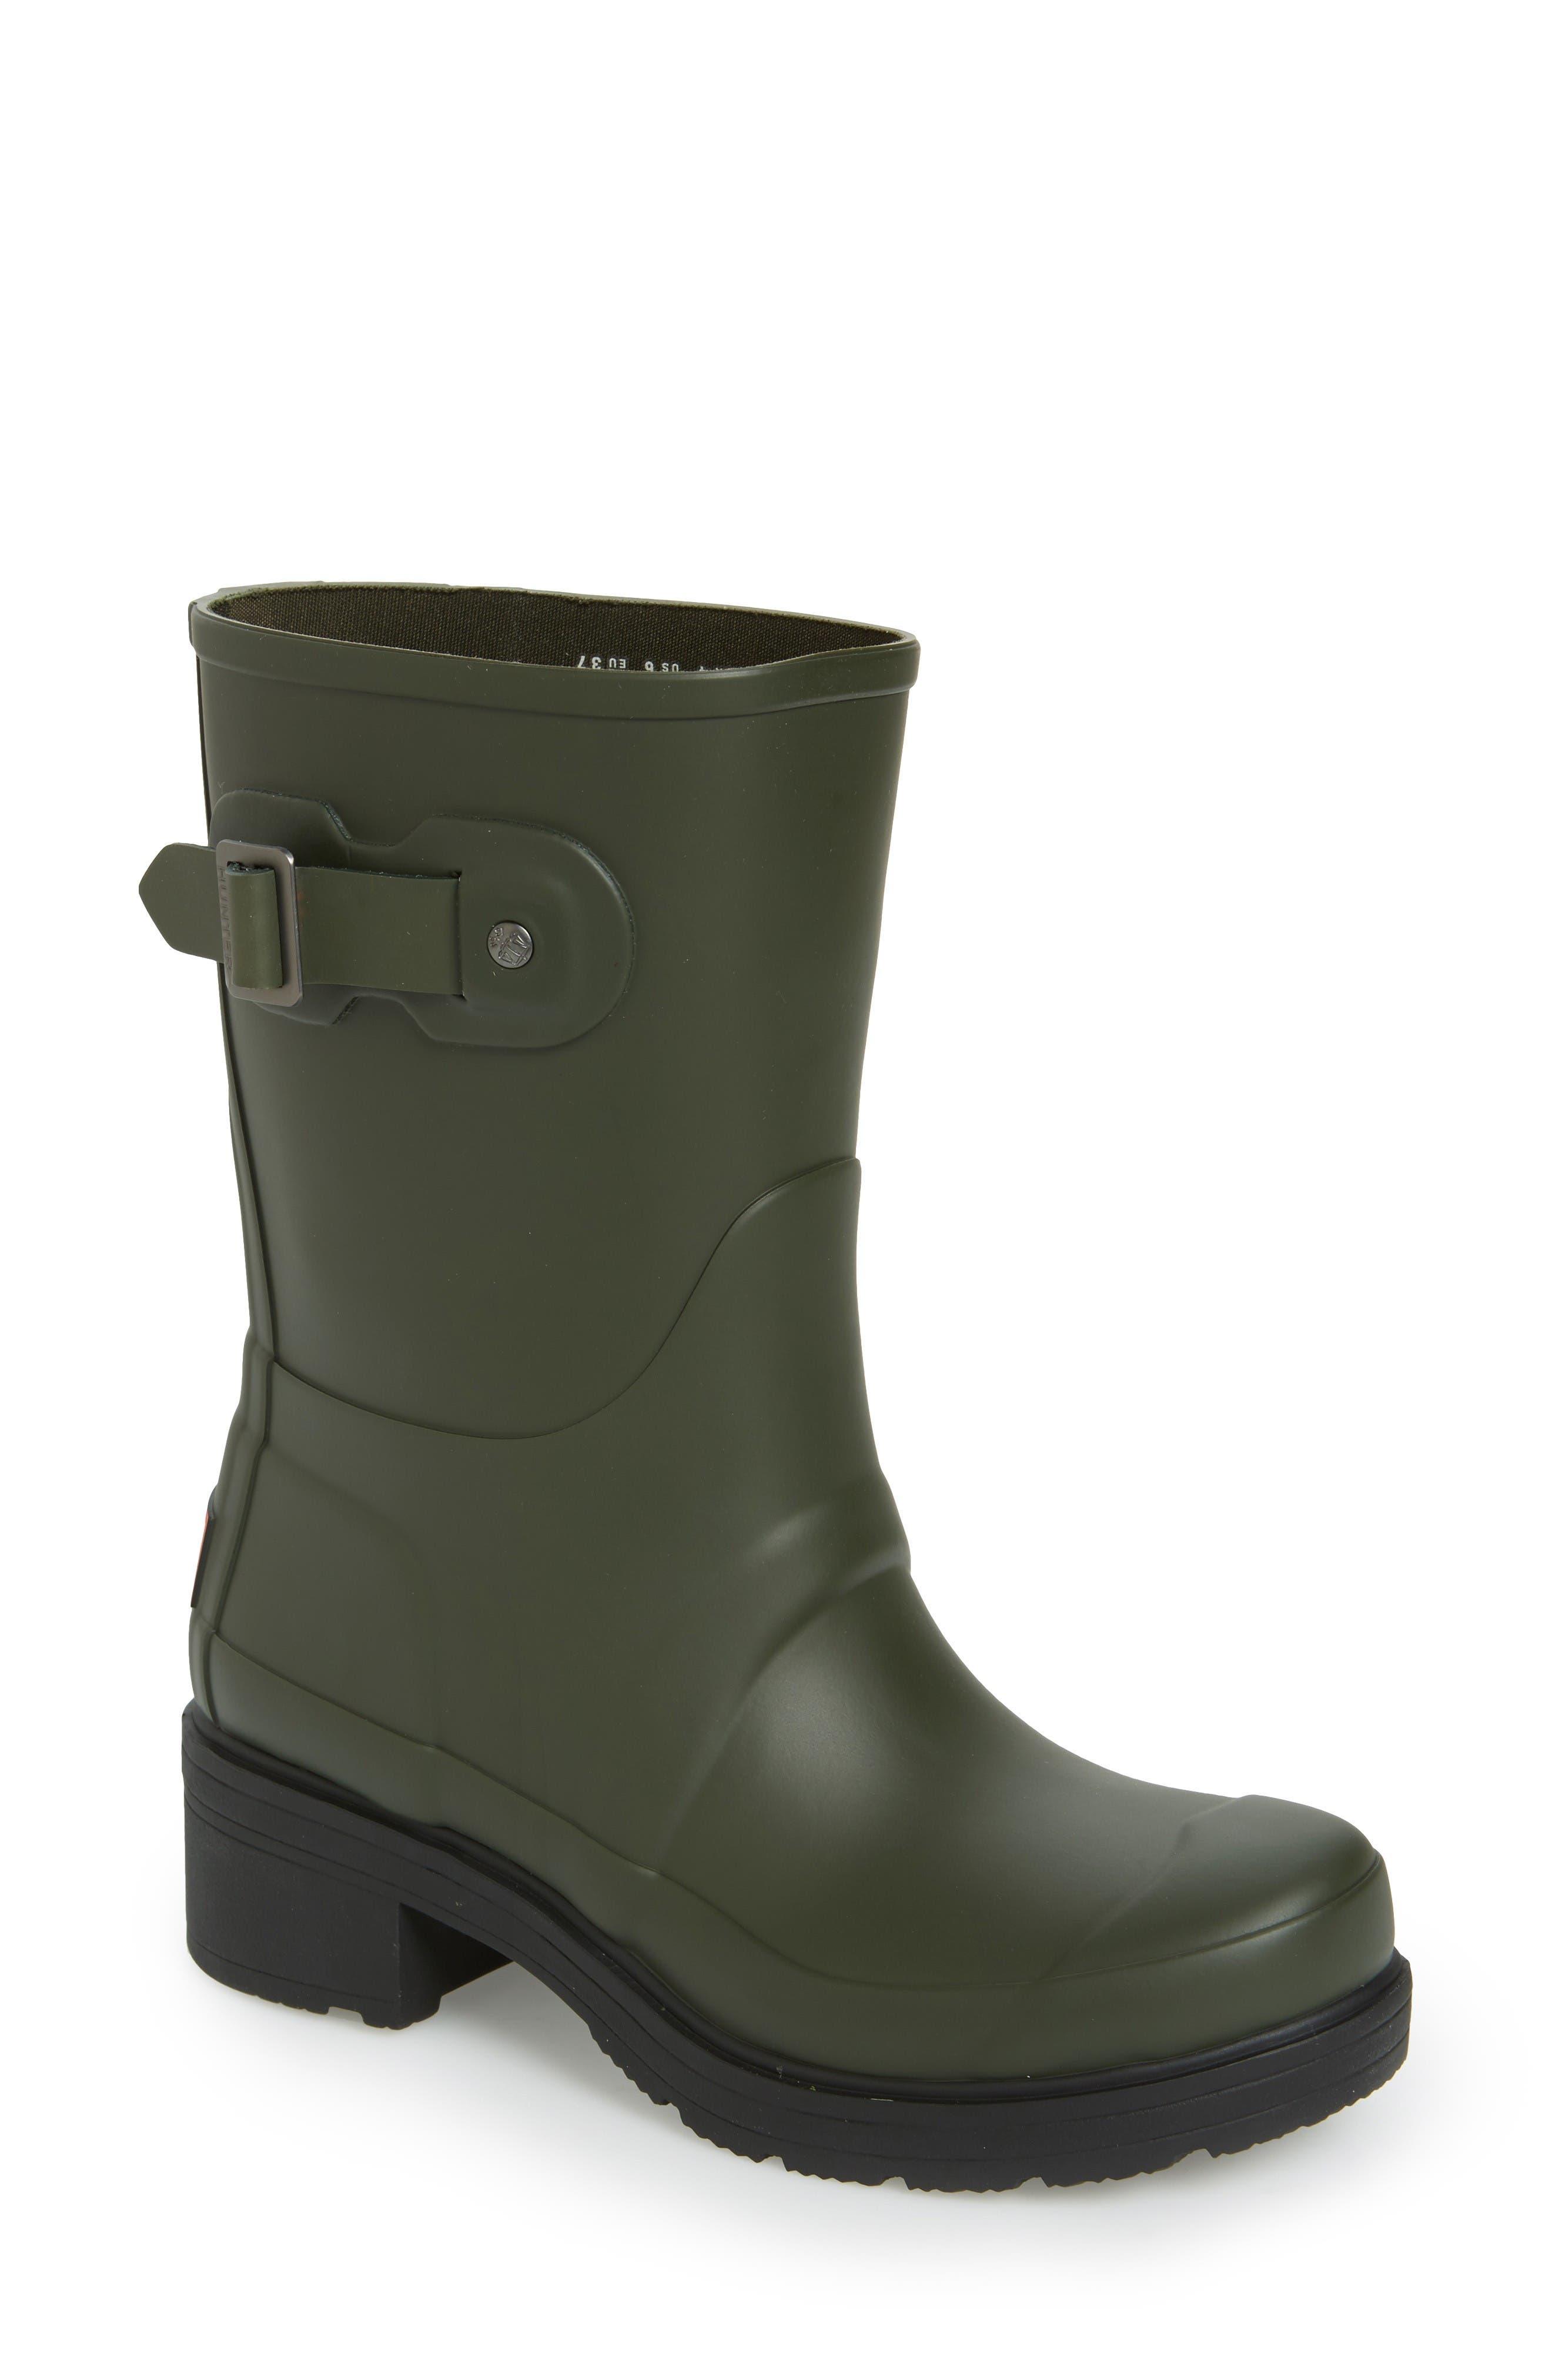 Main Image - Hunter 'Original' Waterproof Ankle Rain Boot (Women)